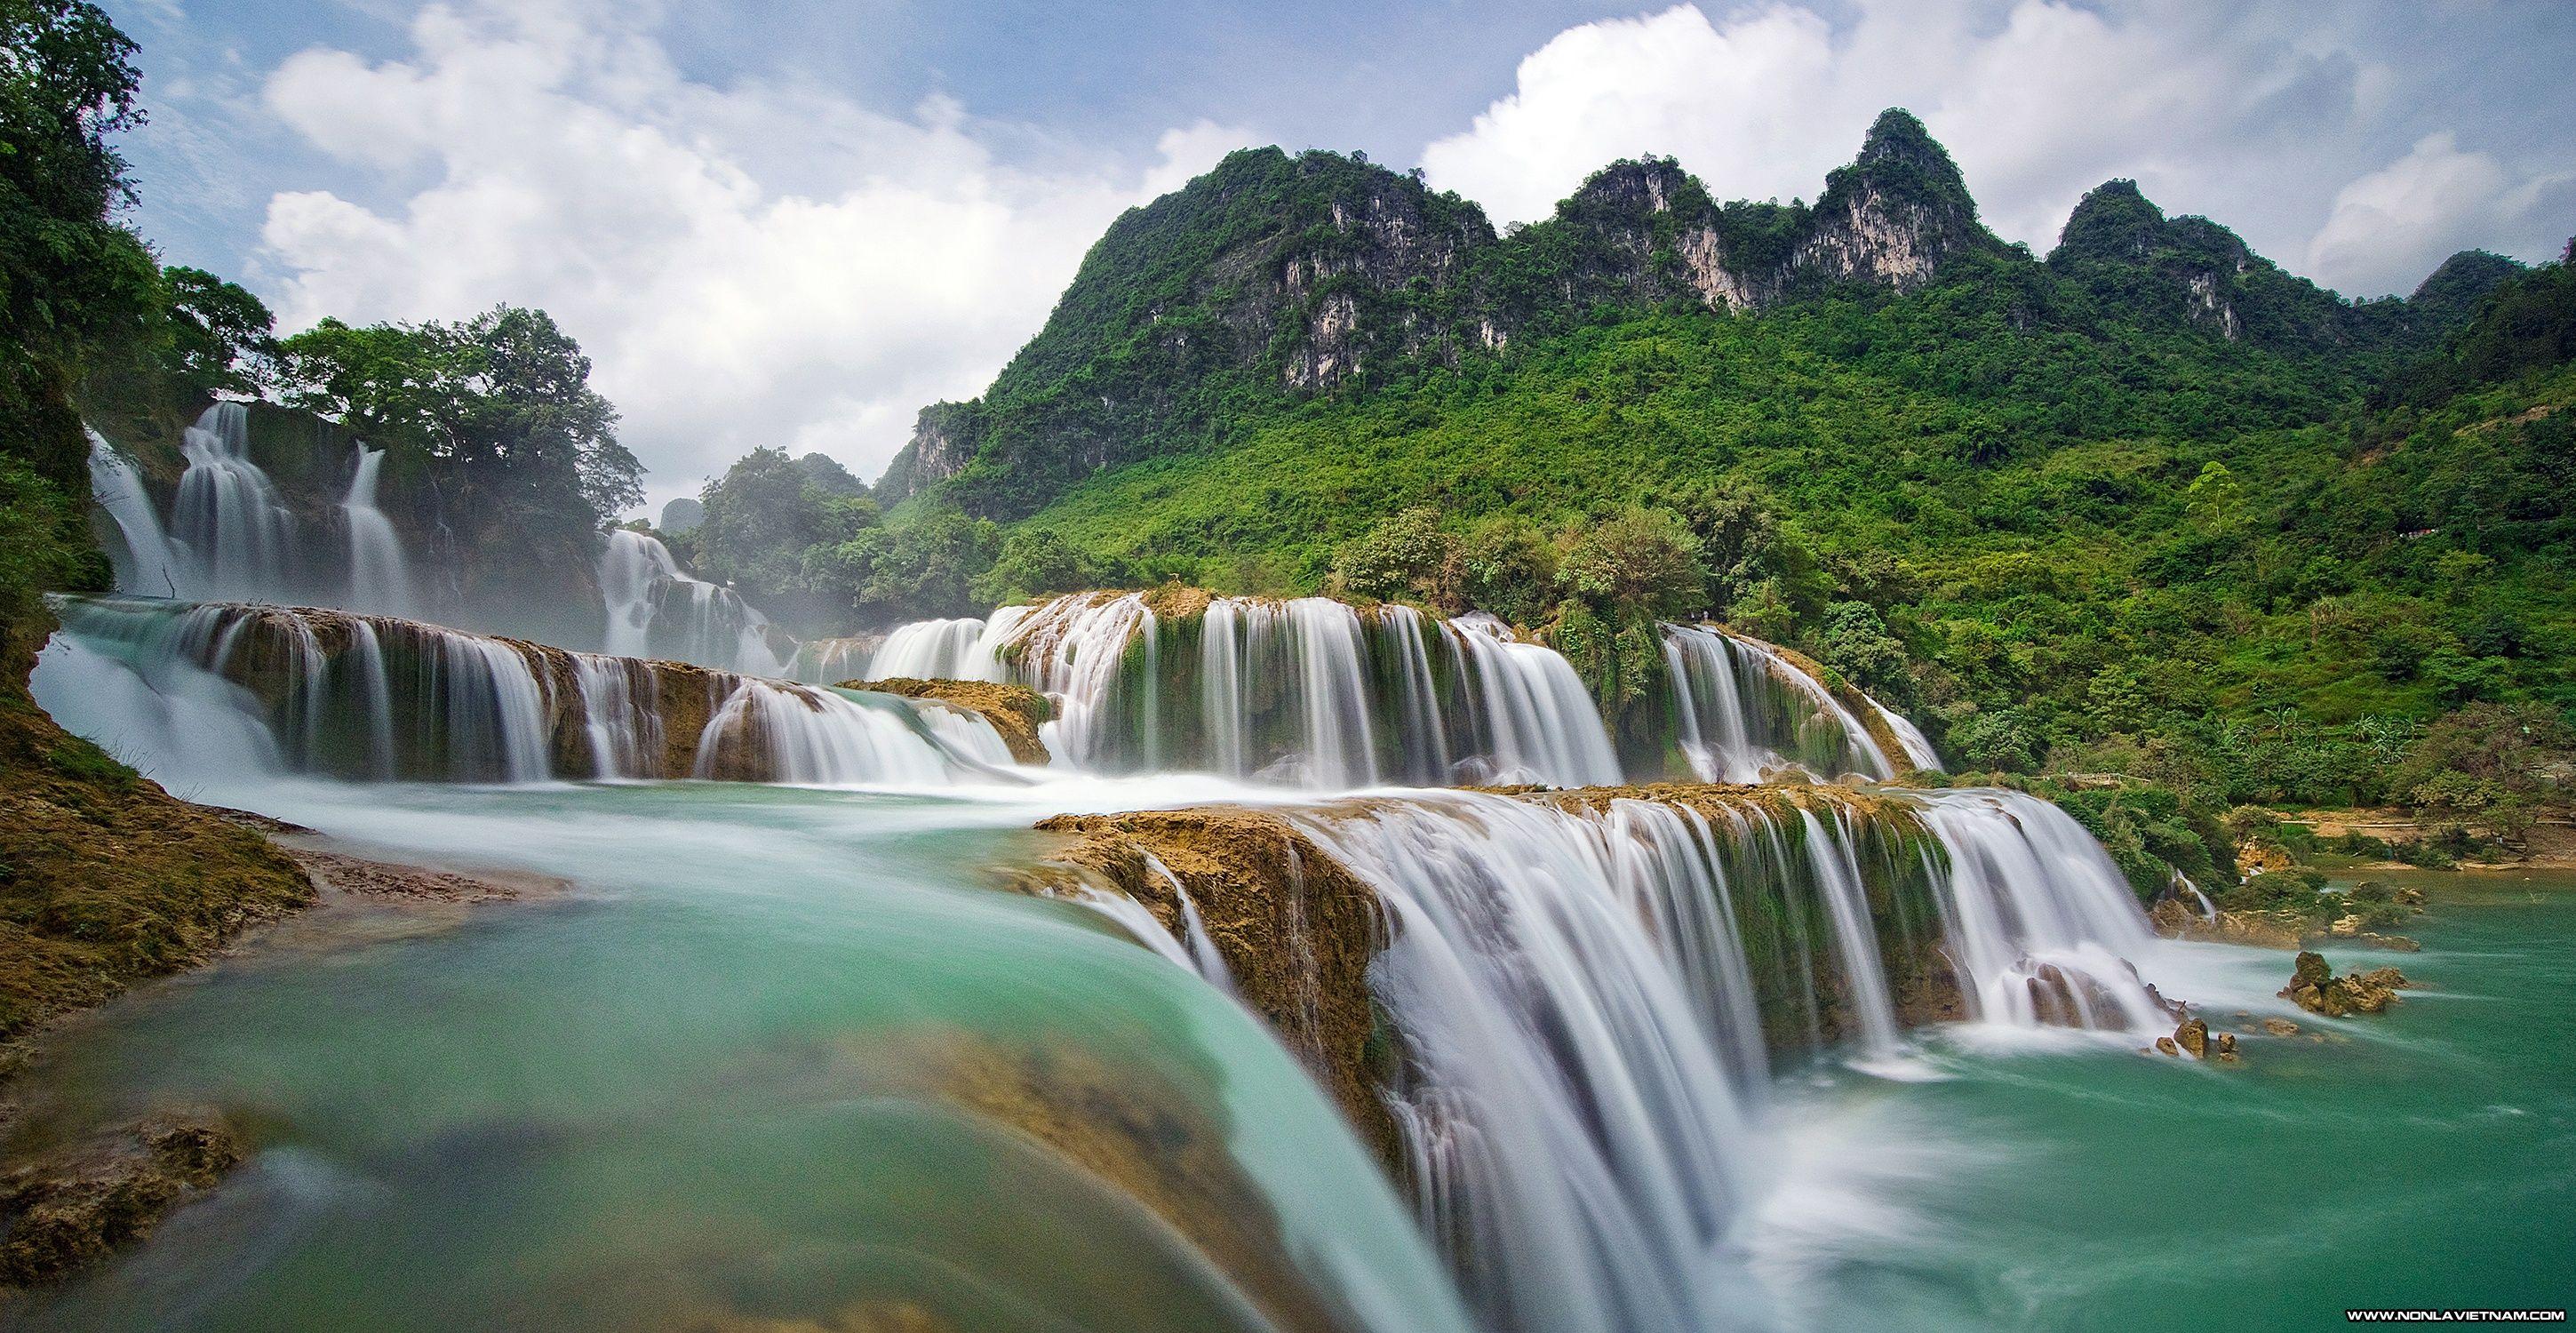 Cascata di Ban Gioc http://viaggiovietnam.asiatica.com/